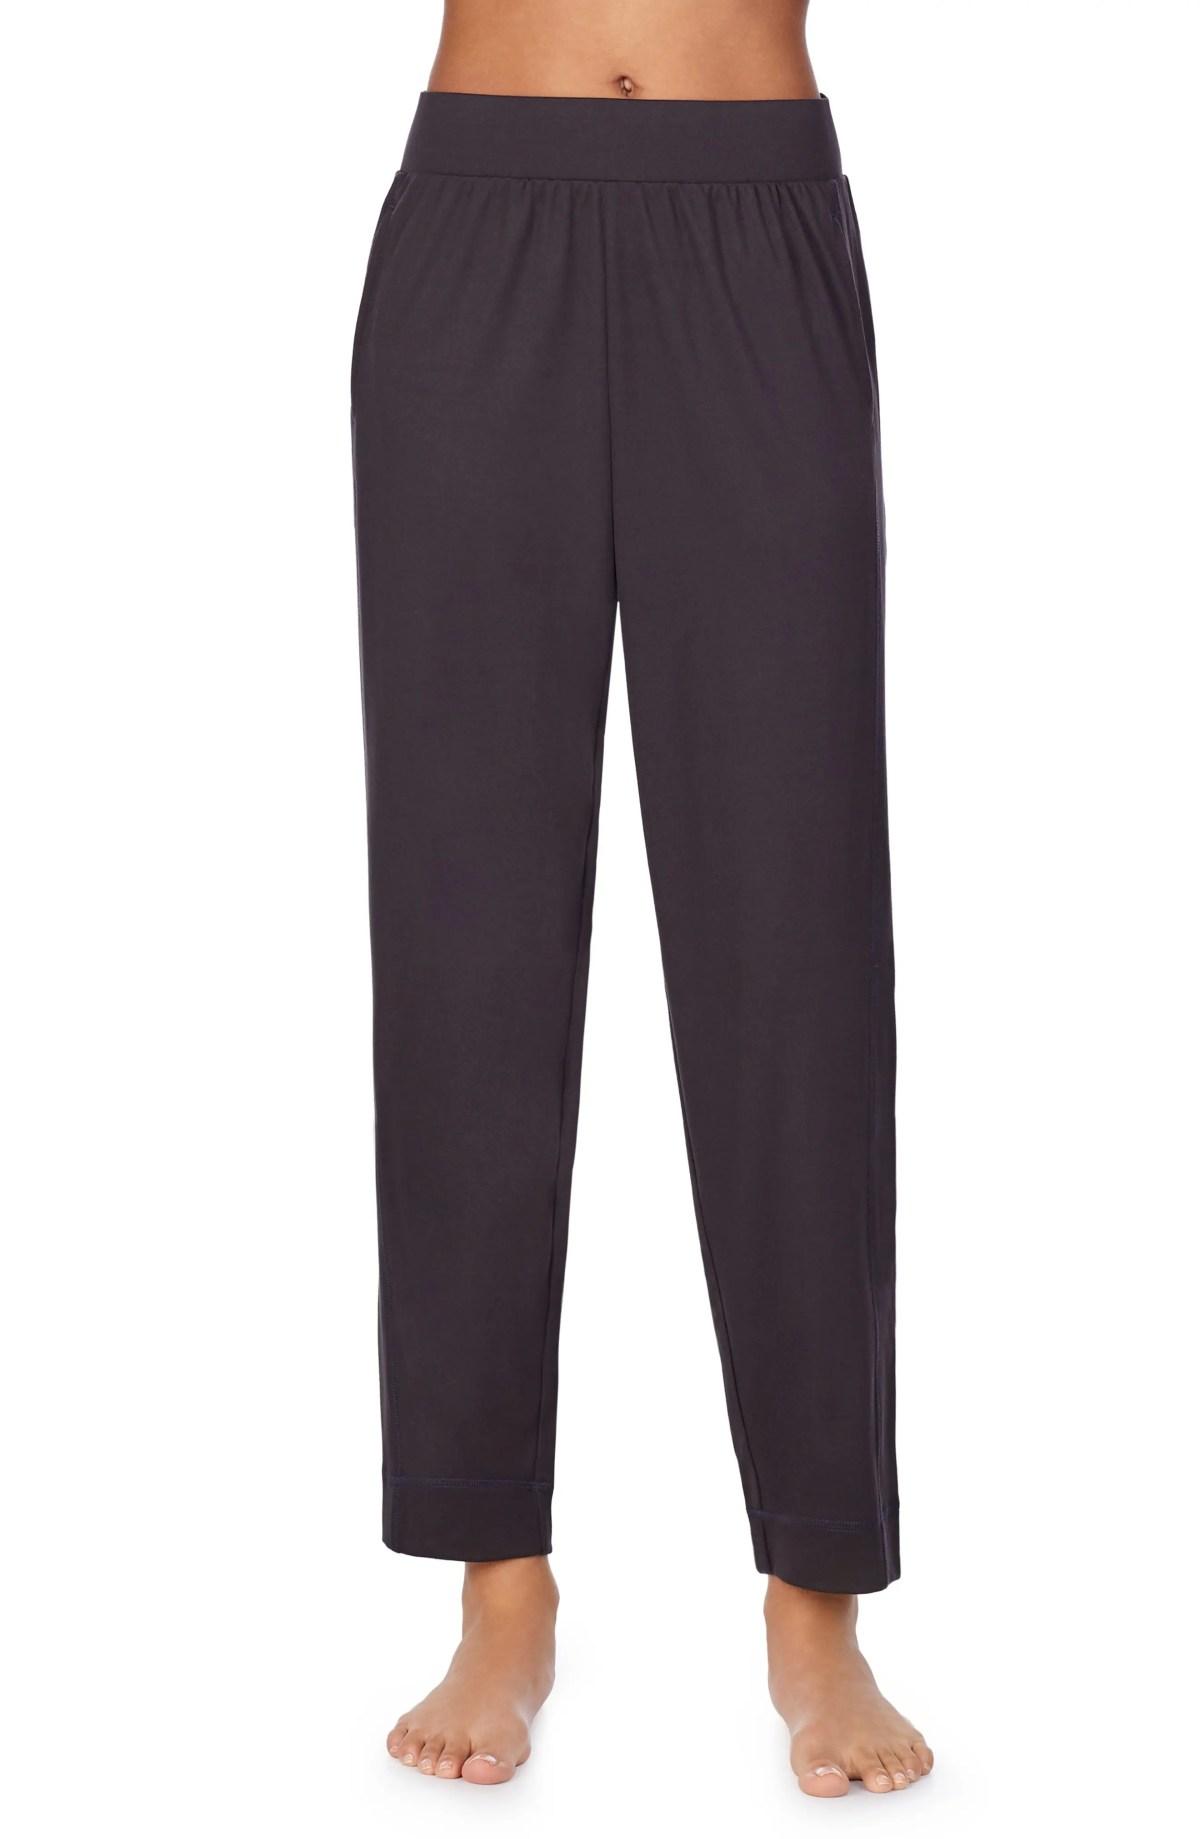 Z WELL Tapered Sleep Pants, Main, color, DARK GREY